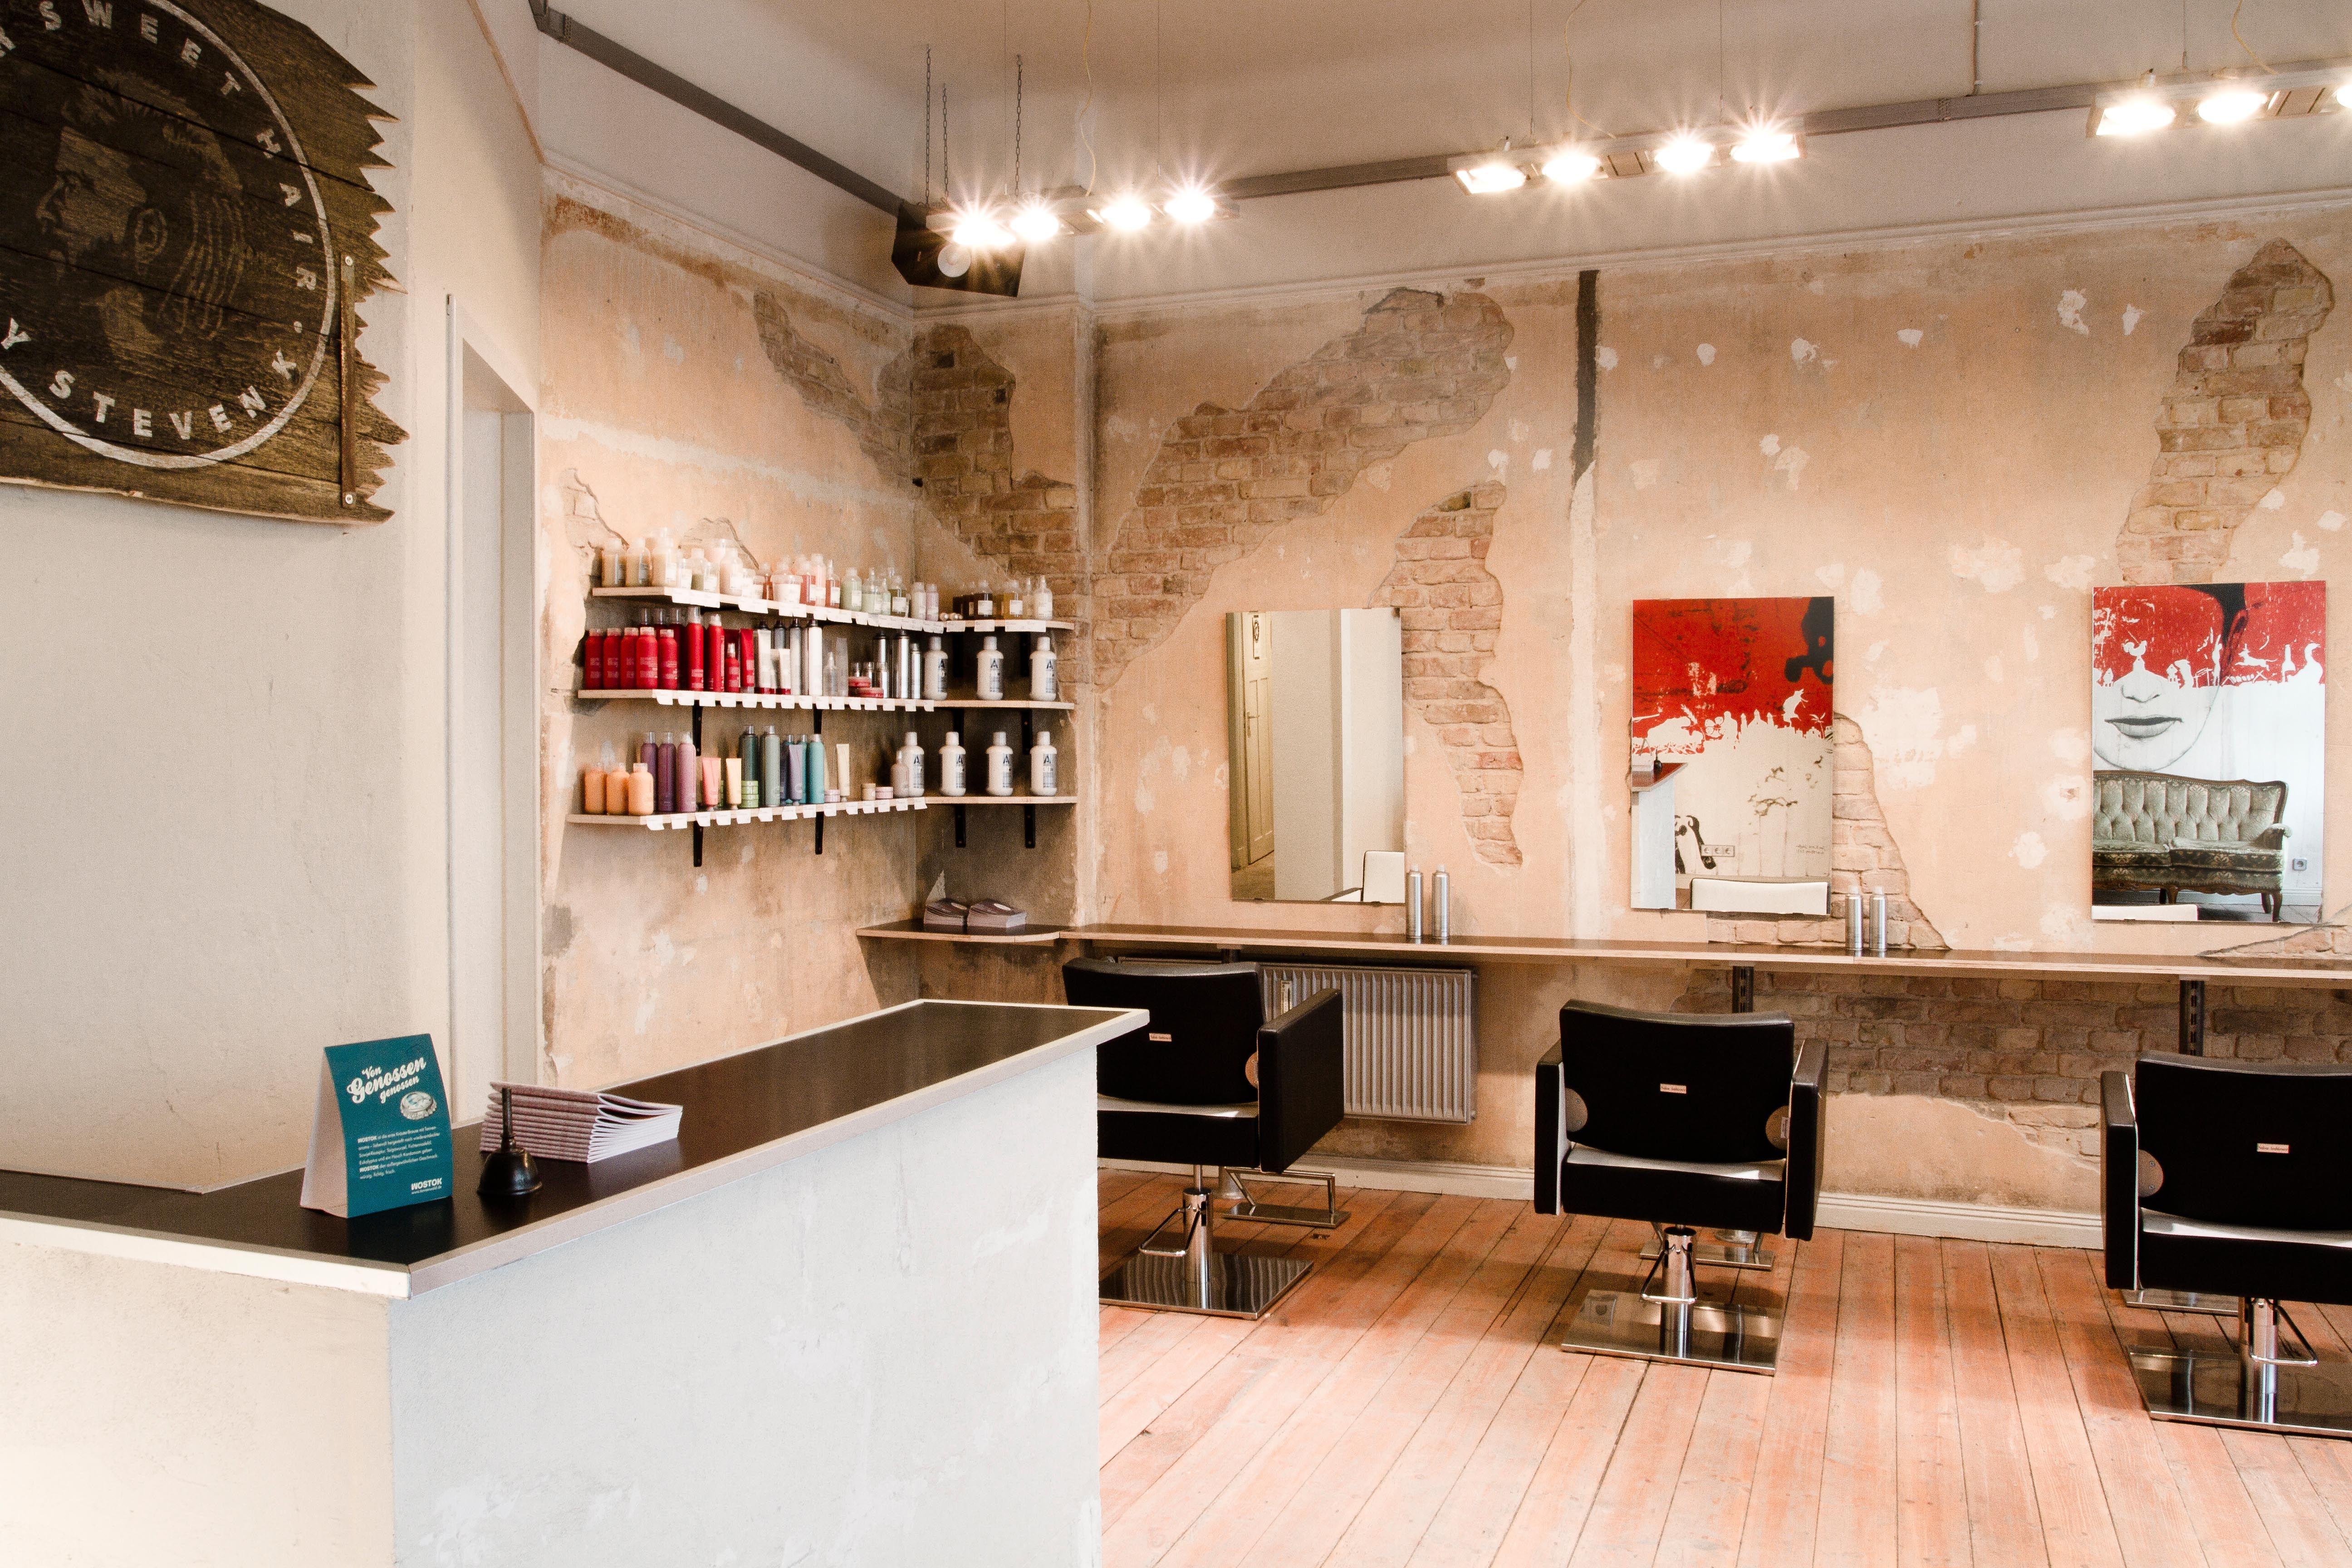 Friseur Hair Sweet Hair, Berlin Design und Innenausbau www.ein ...